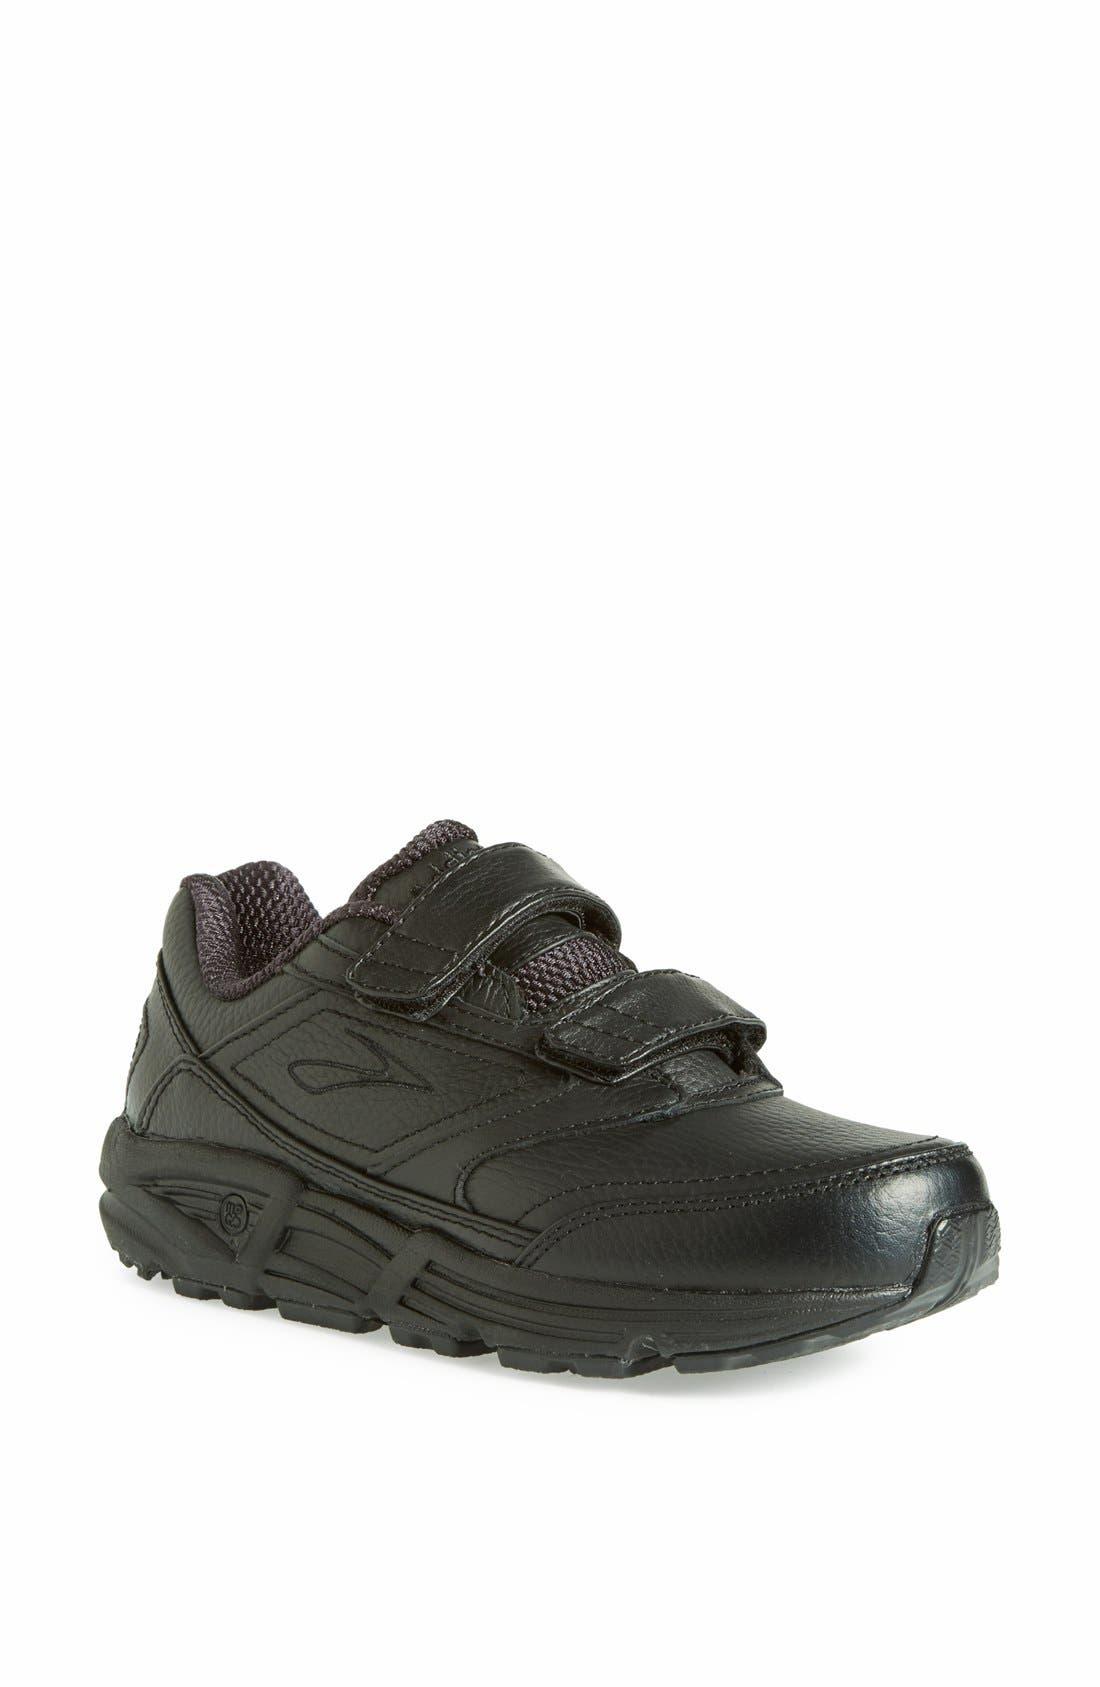 Main Image - Brooks 'Addiction' Walking Shoe (Women)